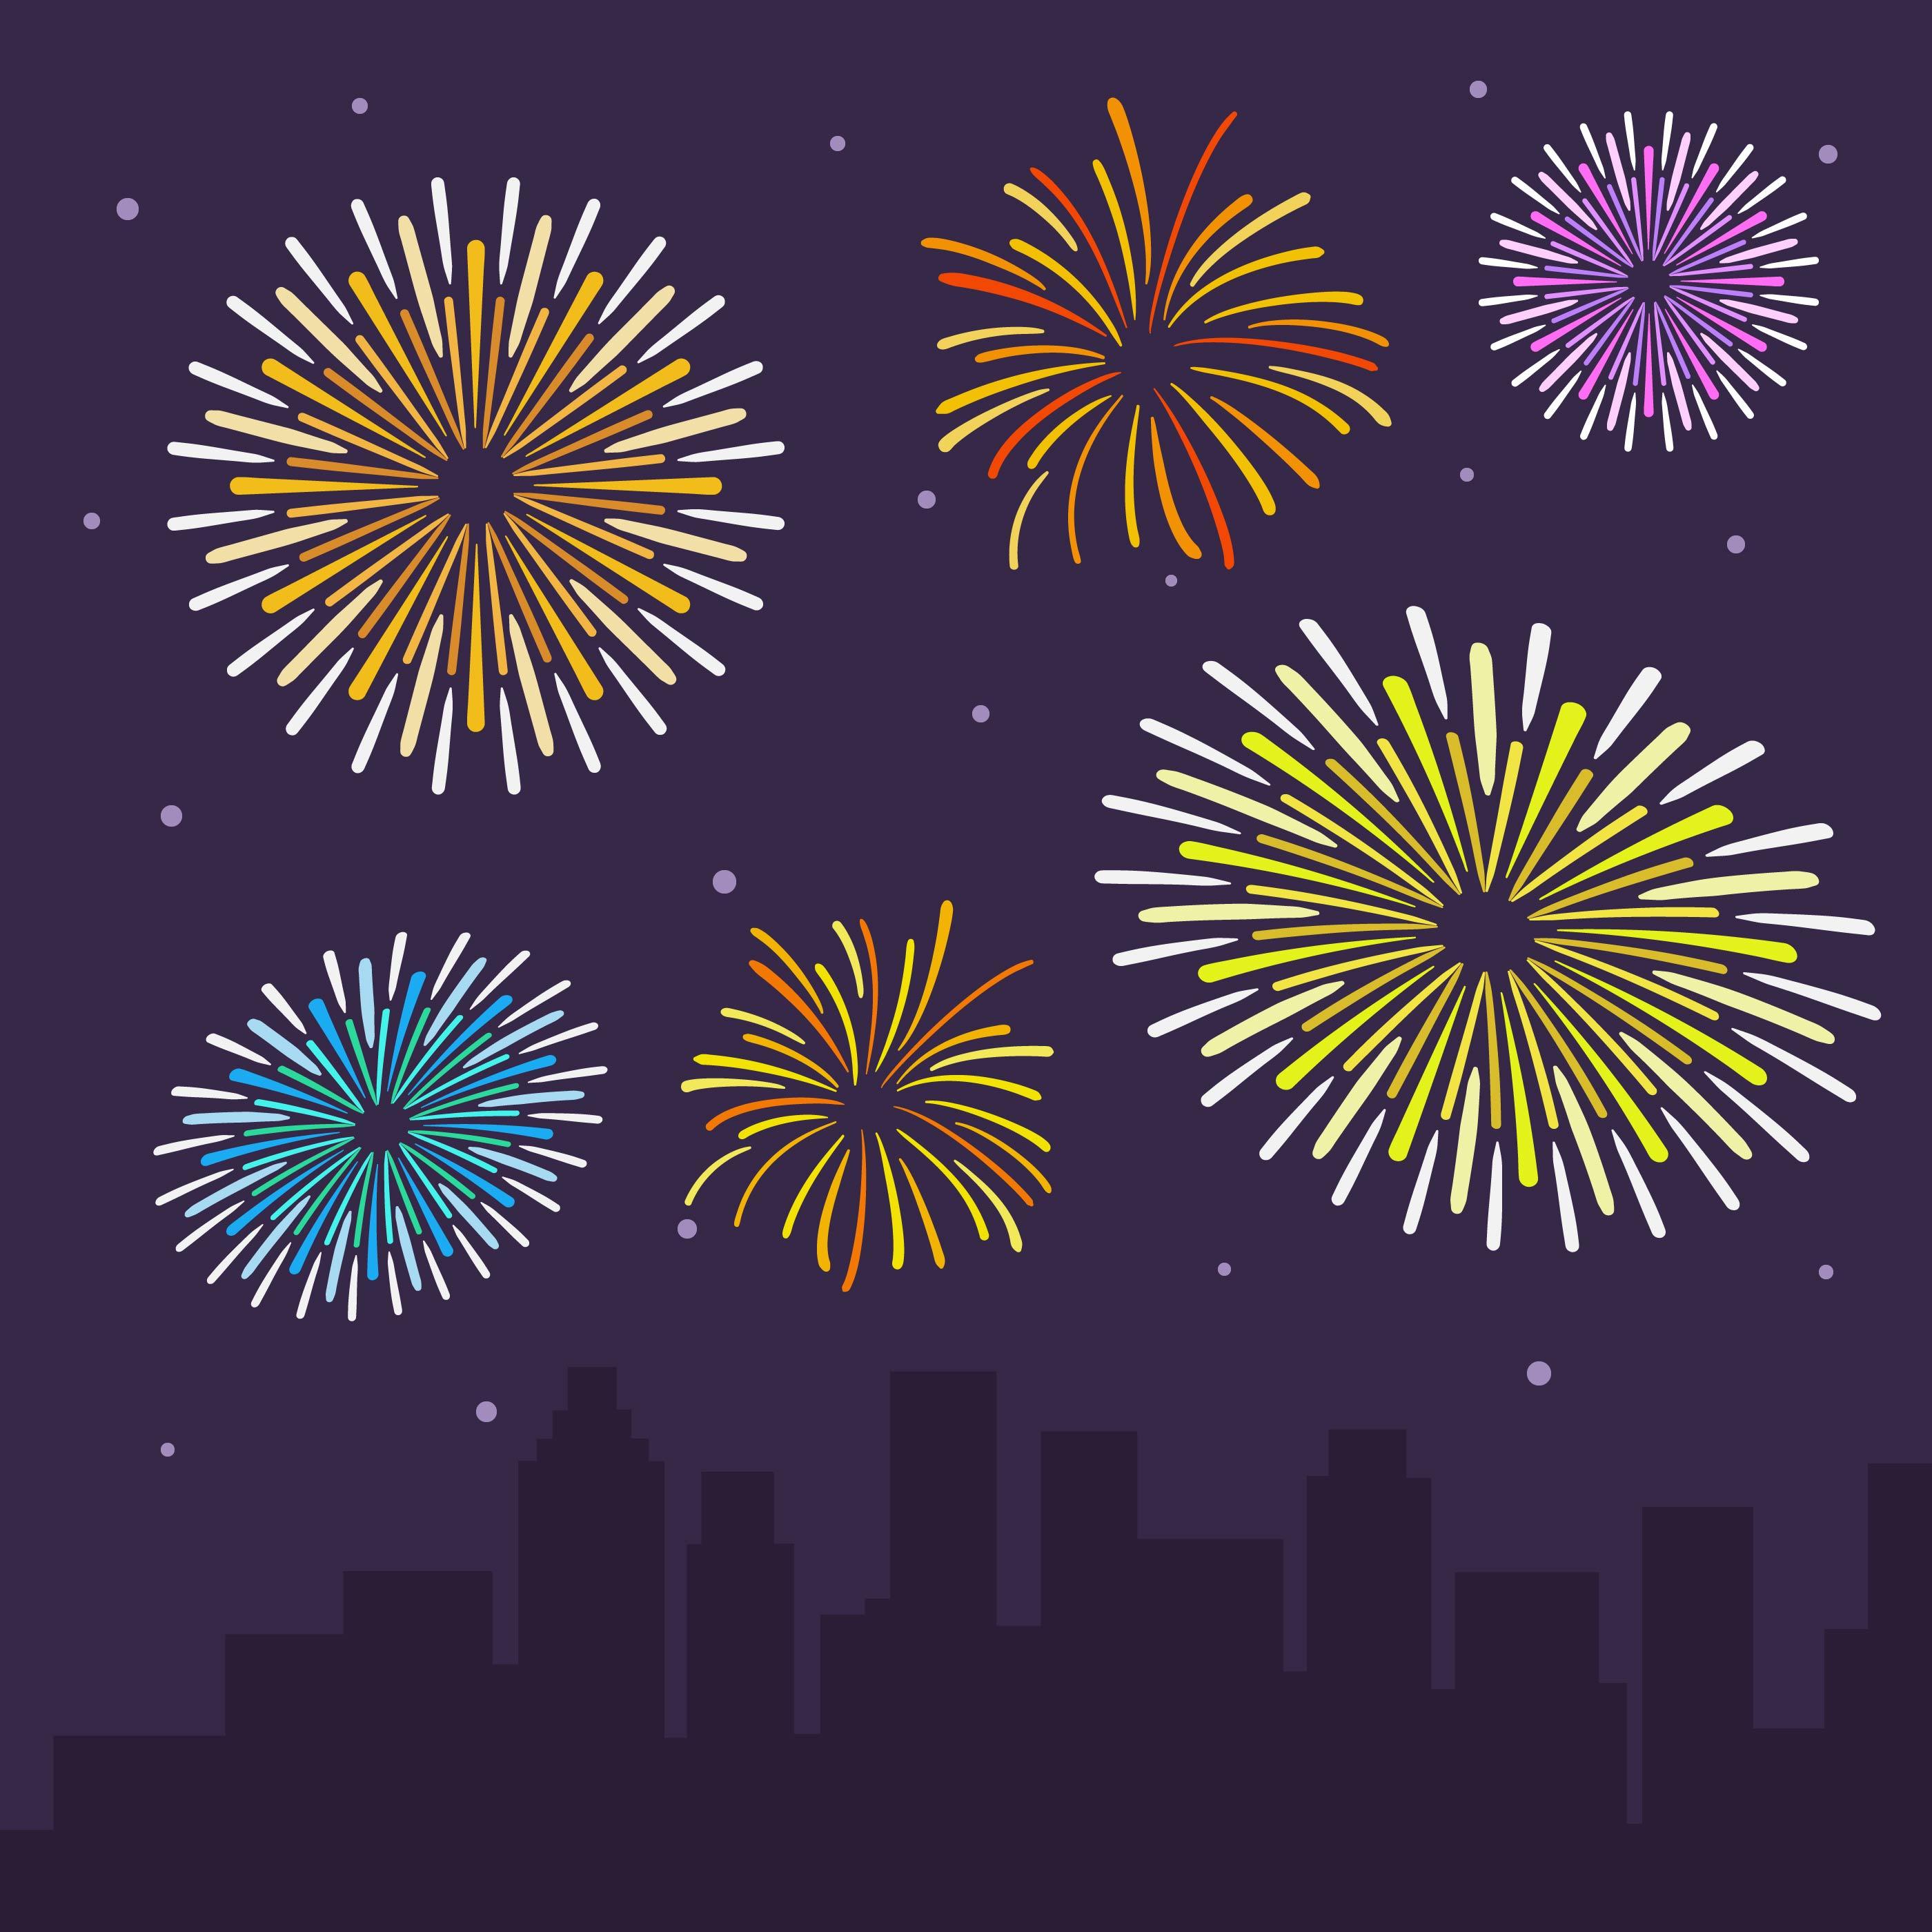 flat fireworks vector illustration